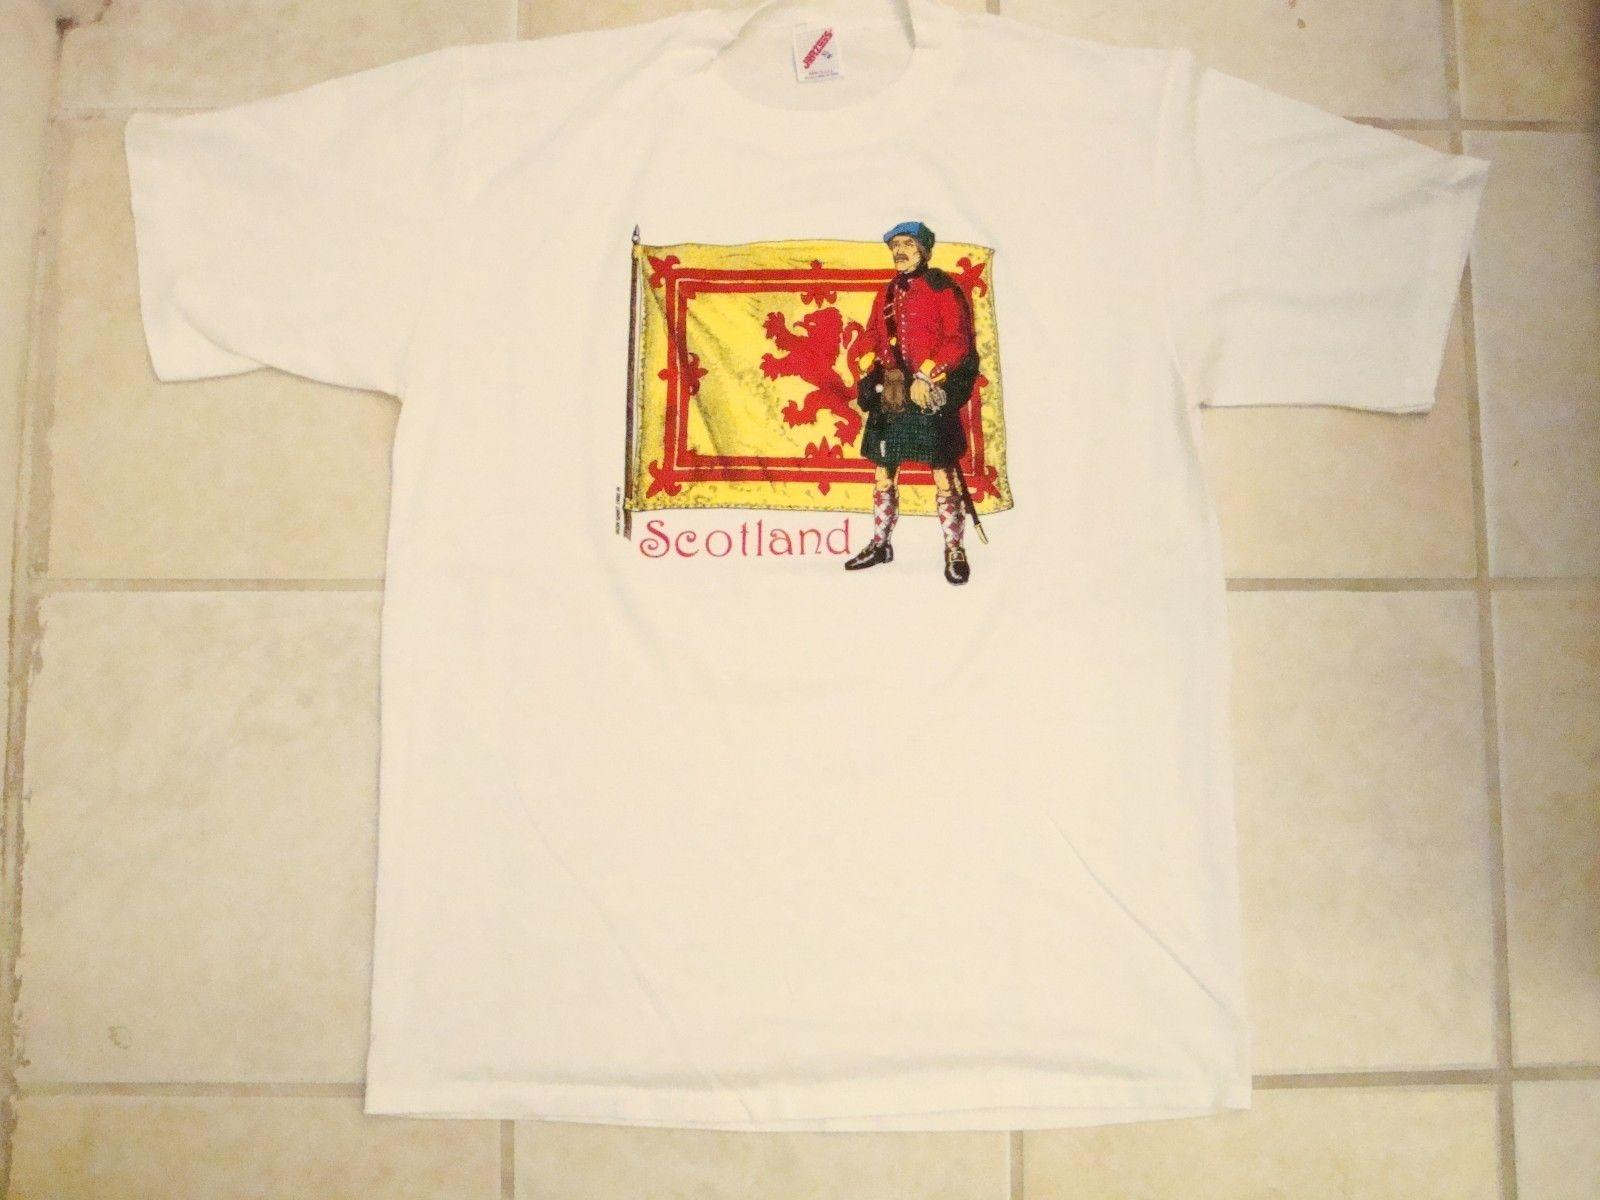 Print Tees Short Sleeve O-Neck Vintage Scotland Scottish Flag Bagpipes Kilt Soft White T Shirt L Men Summer Style